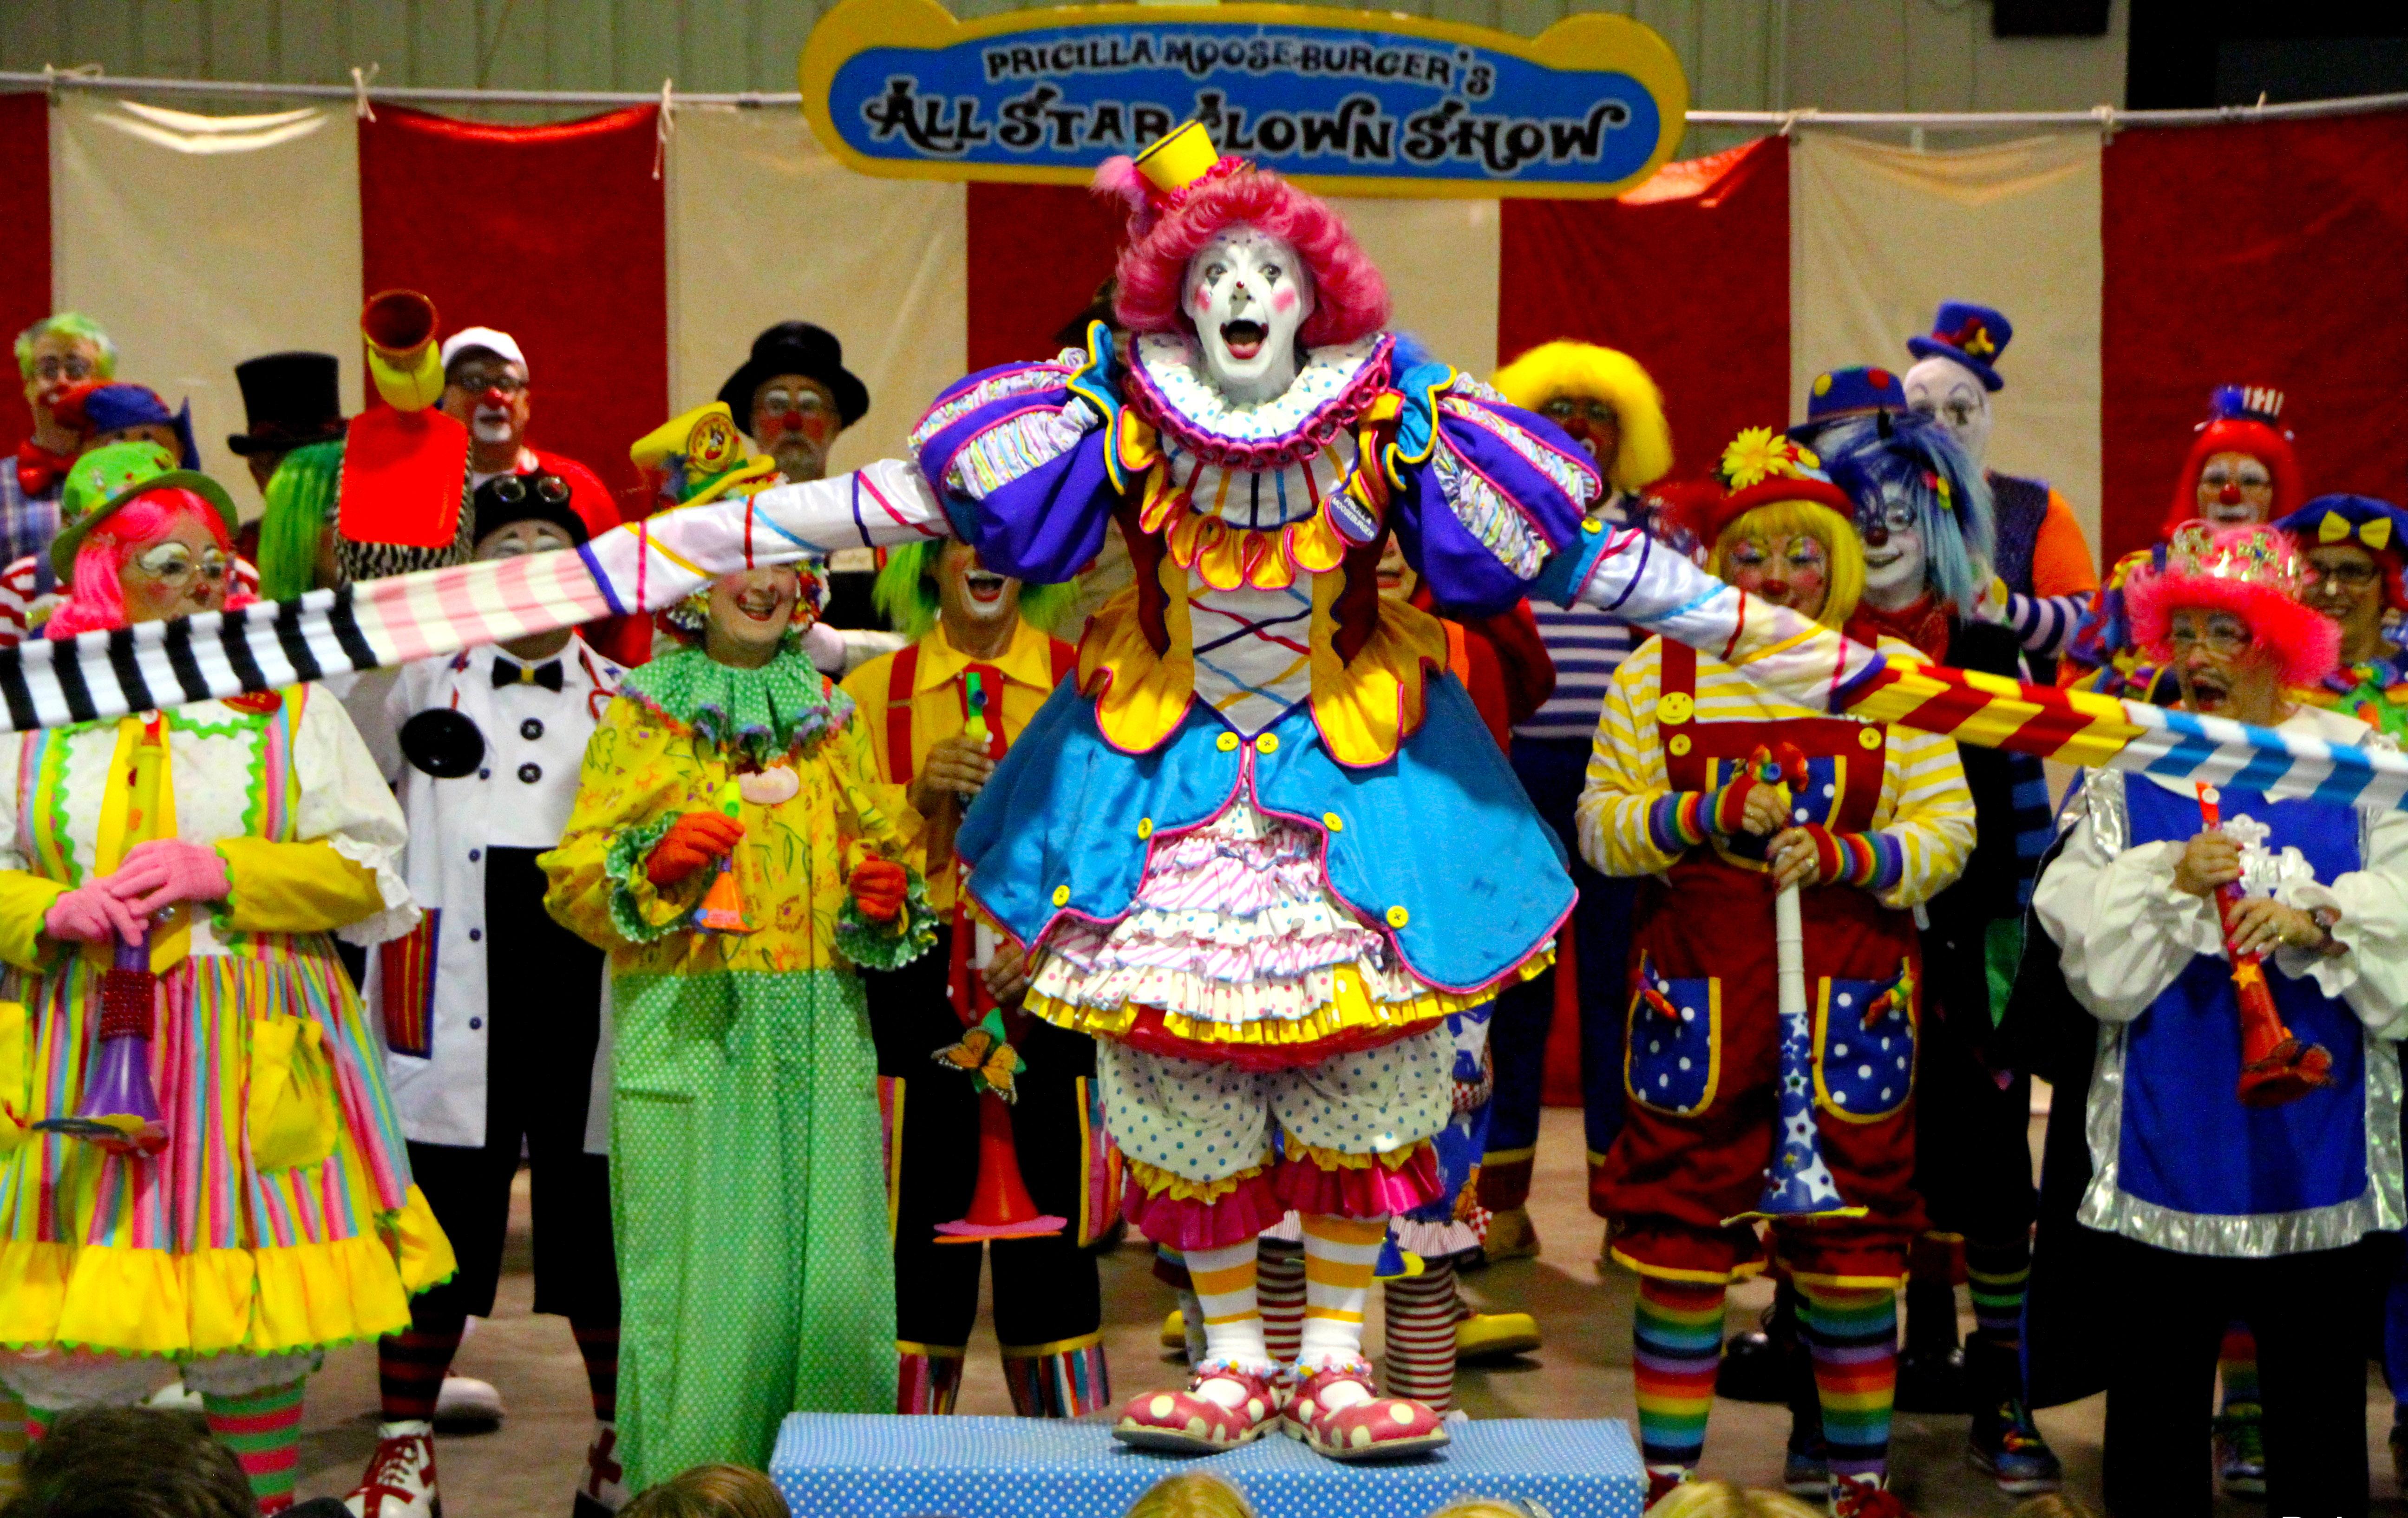 clownshow-pricilla.jpg